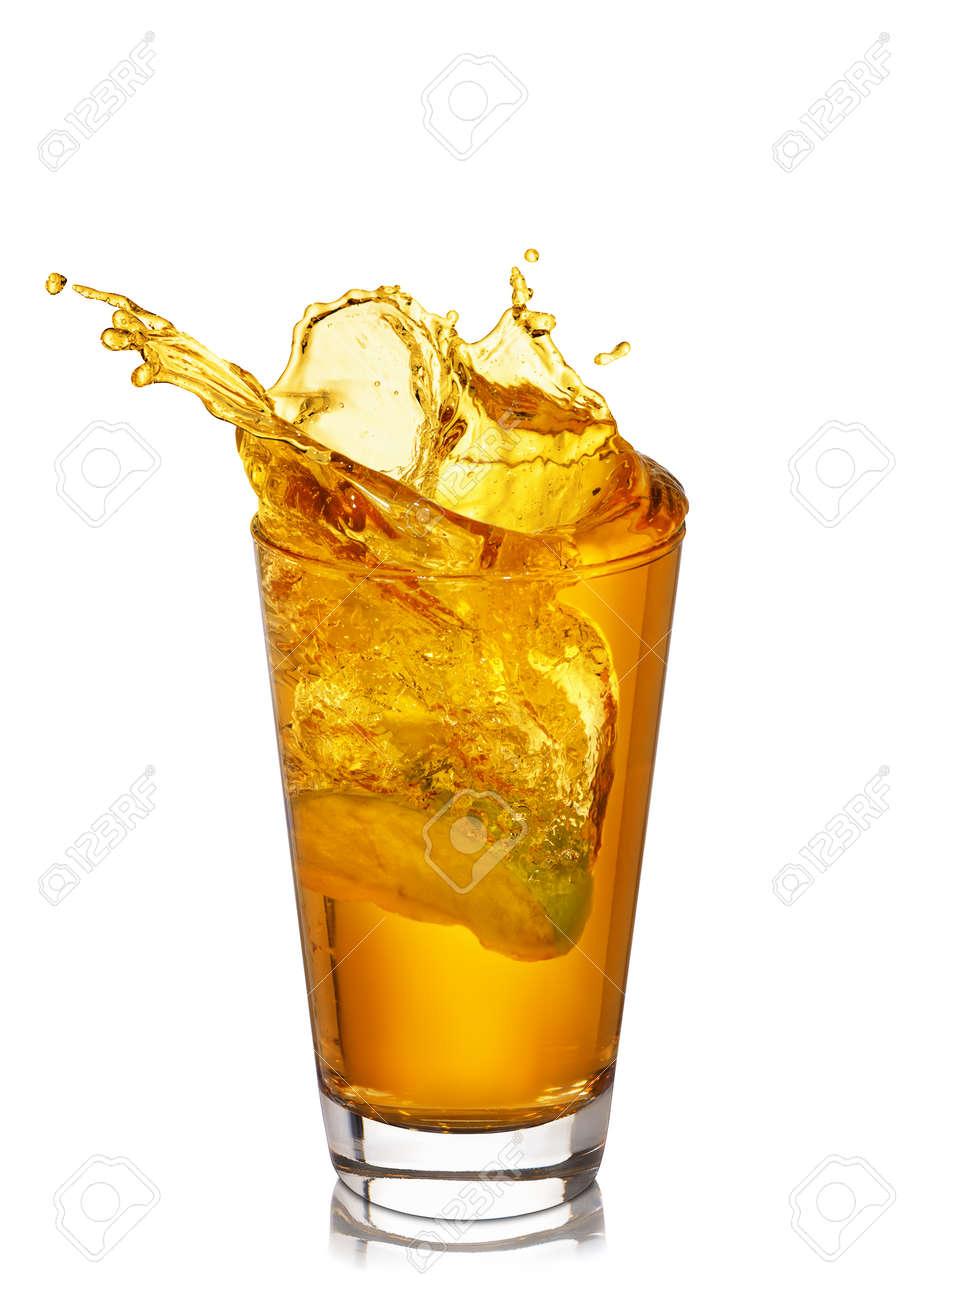 glass of splashing apple juice - 97216443